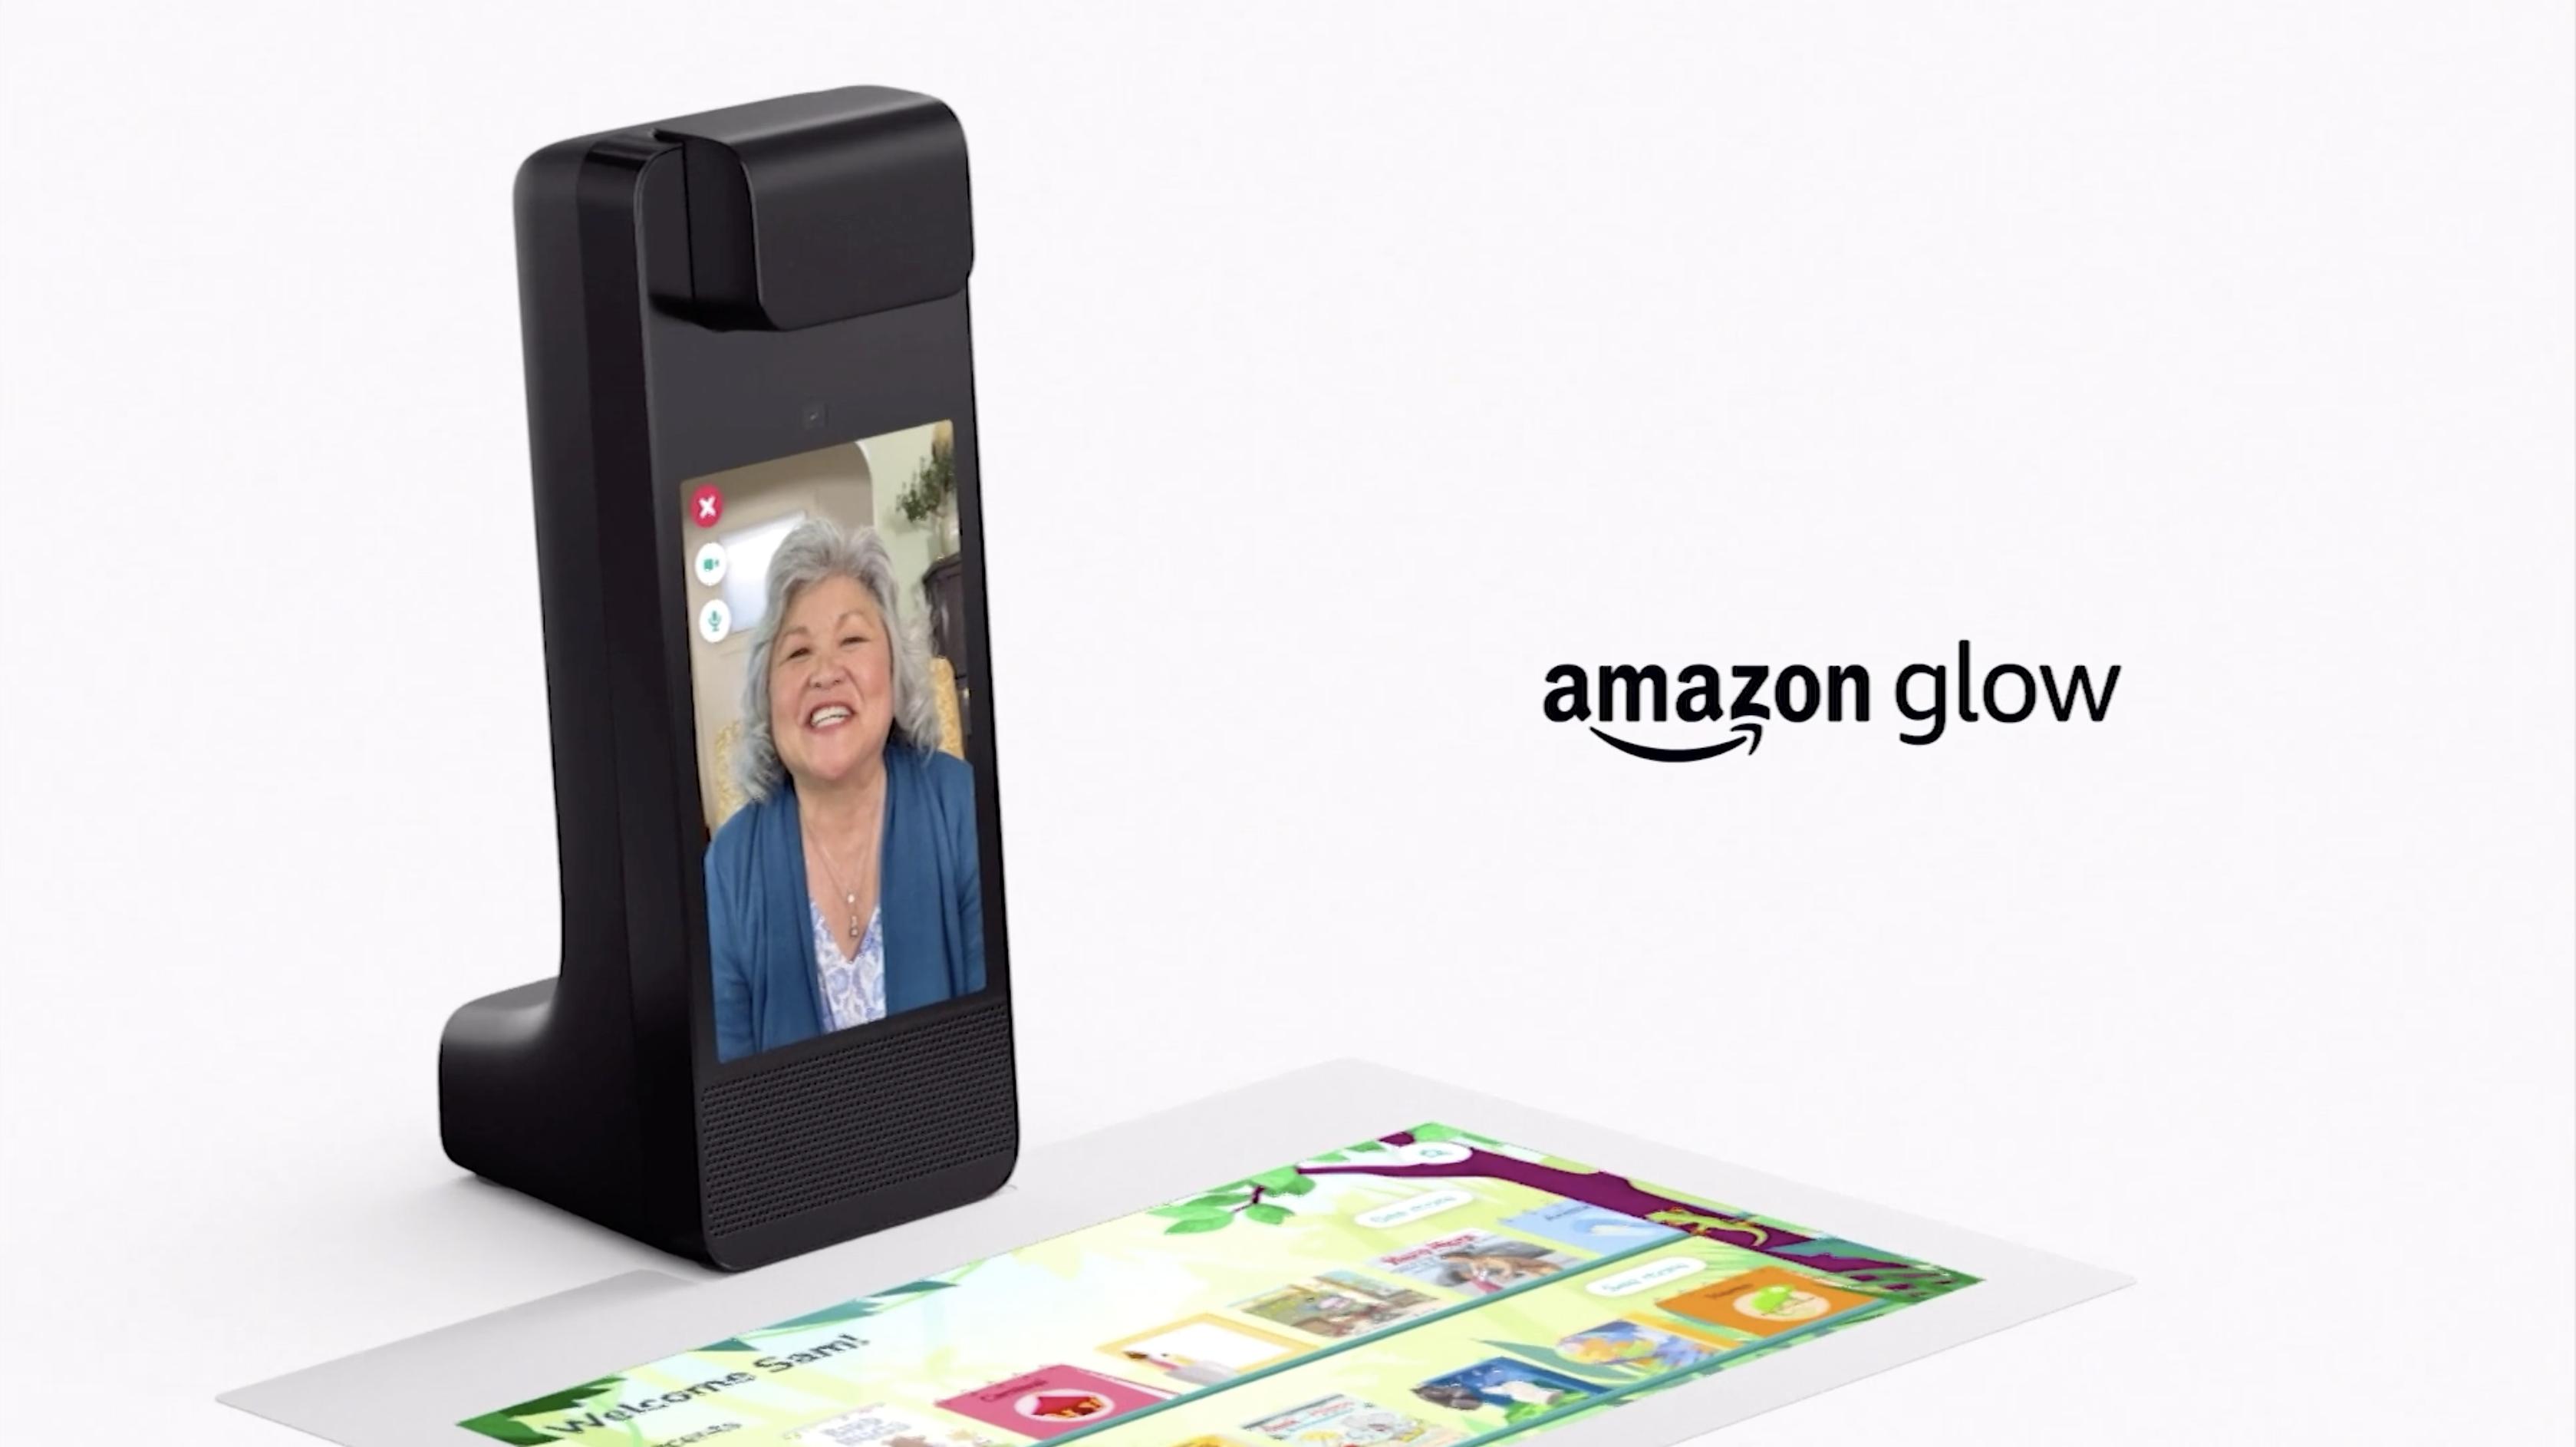 Amazon Glow debuts at Amazon event